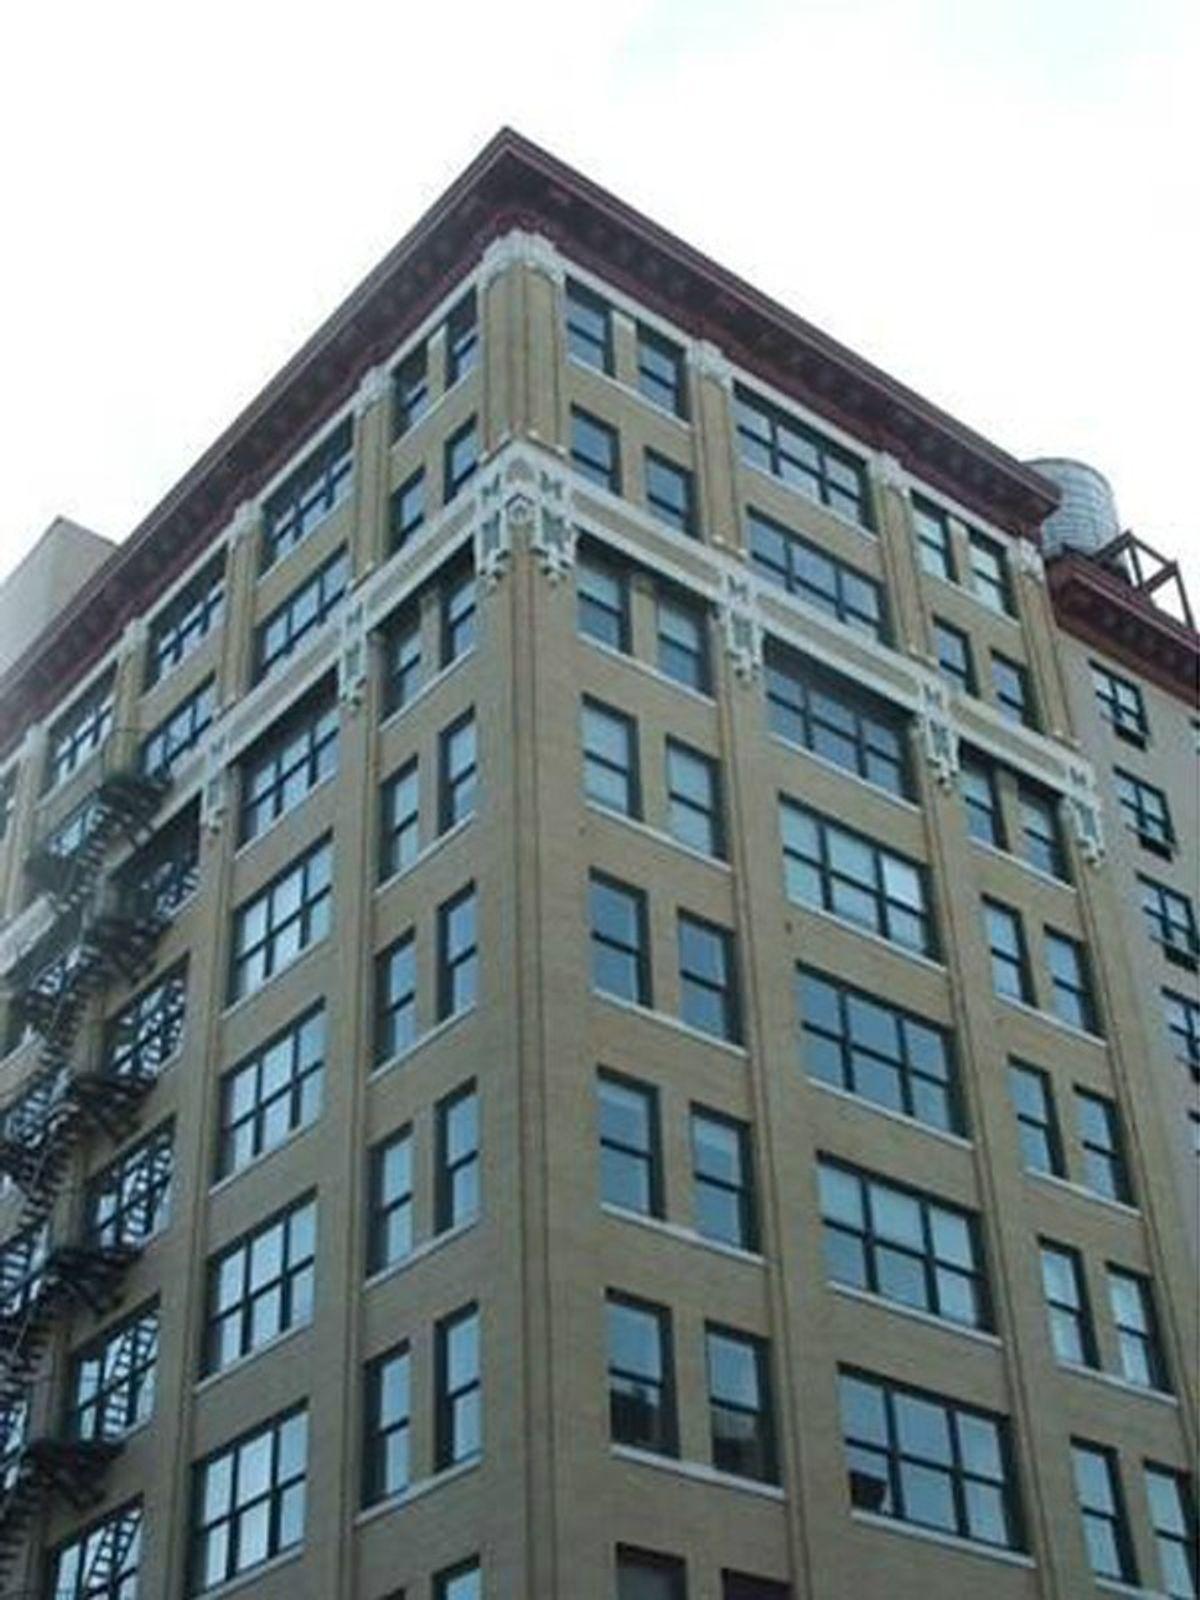 Prewar Condo Loft at the Solita Building